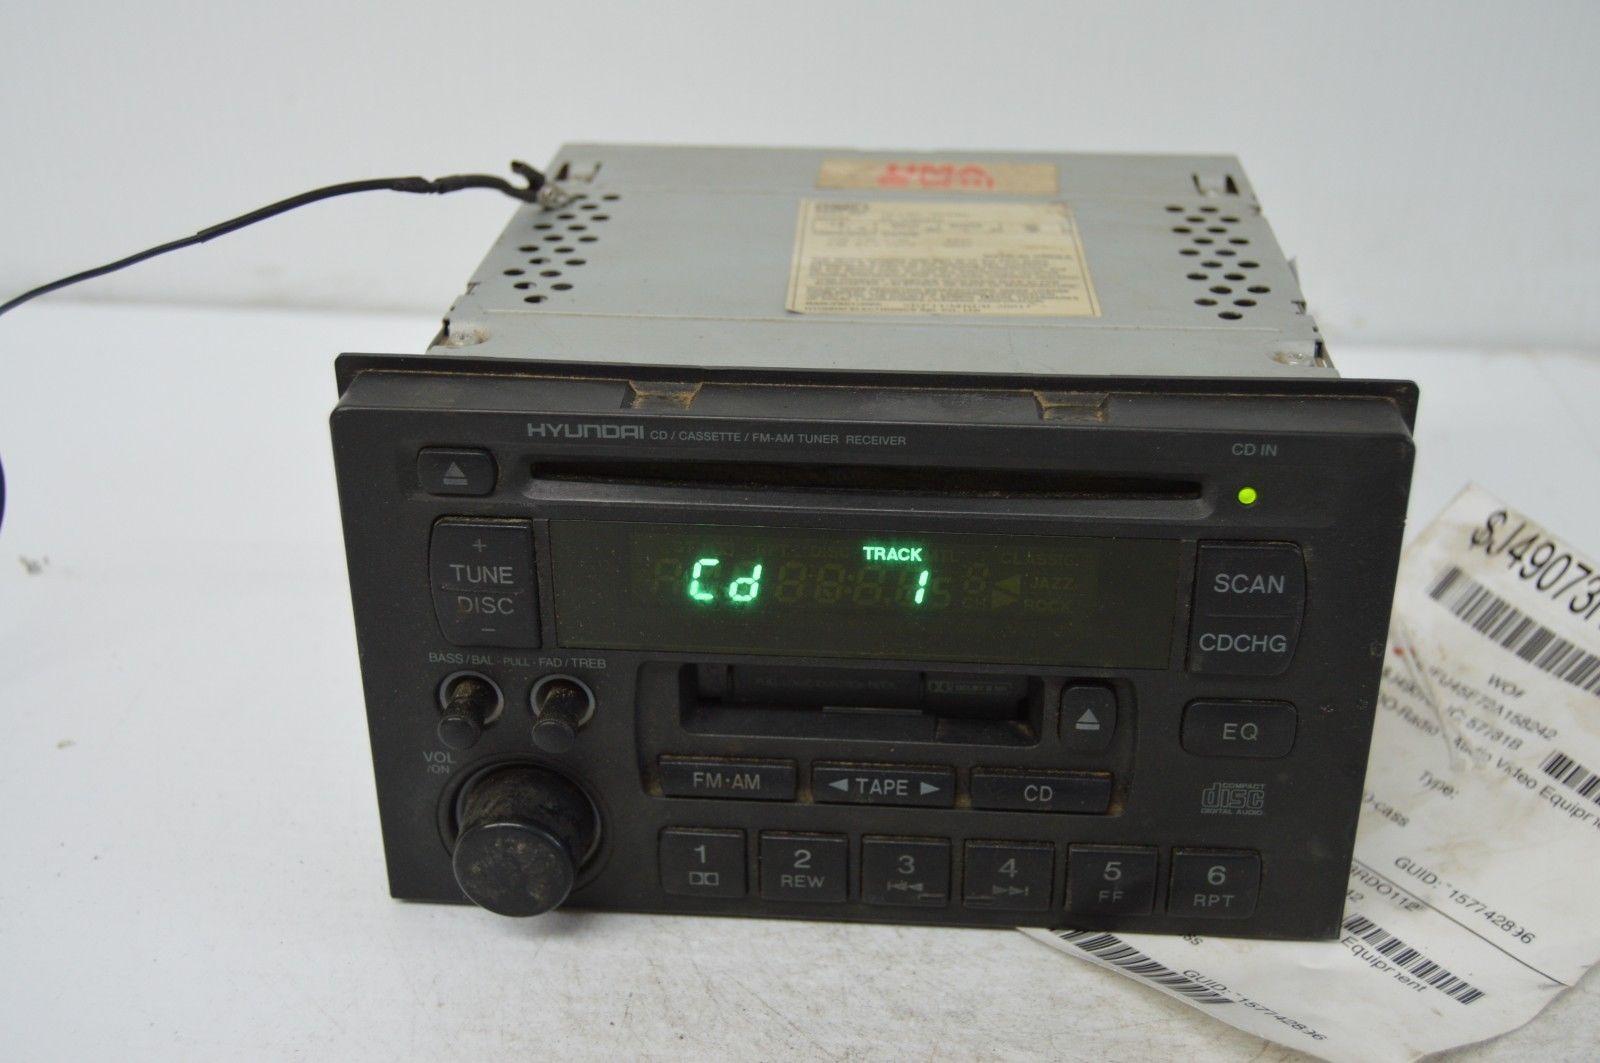 2002 2003 HYUNDAI XG RADIO CD PLAYER OEM RADIO 96140-39100 TESTED G52#023